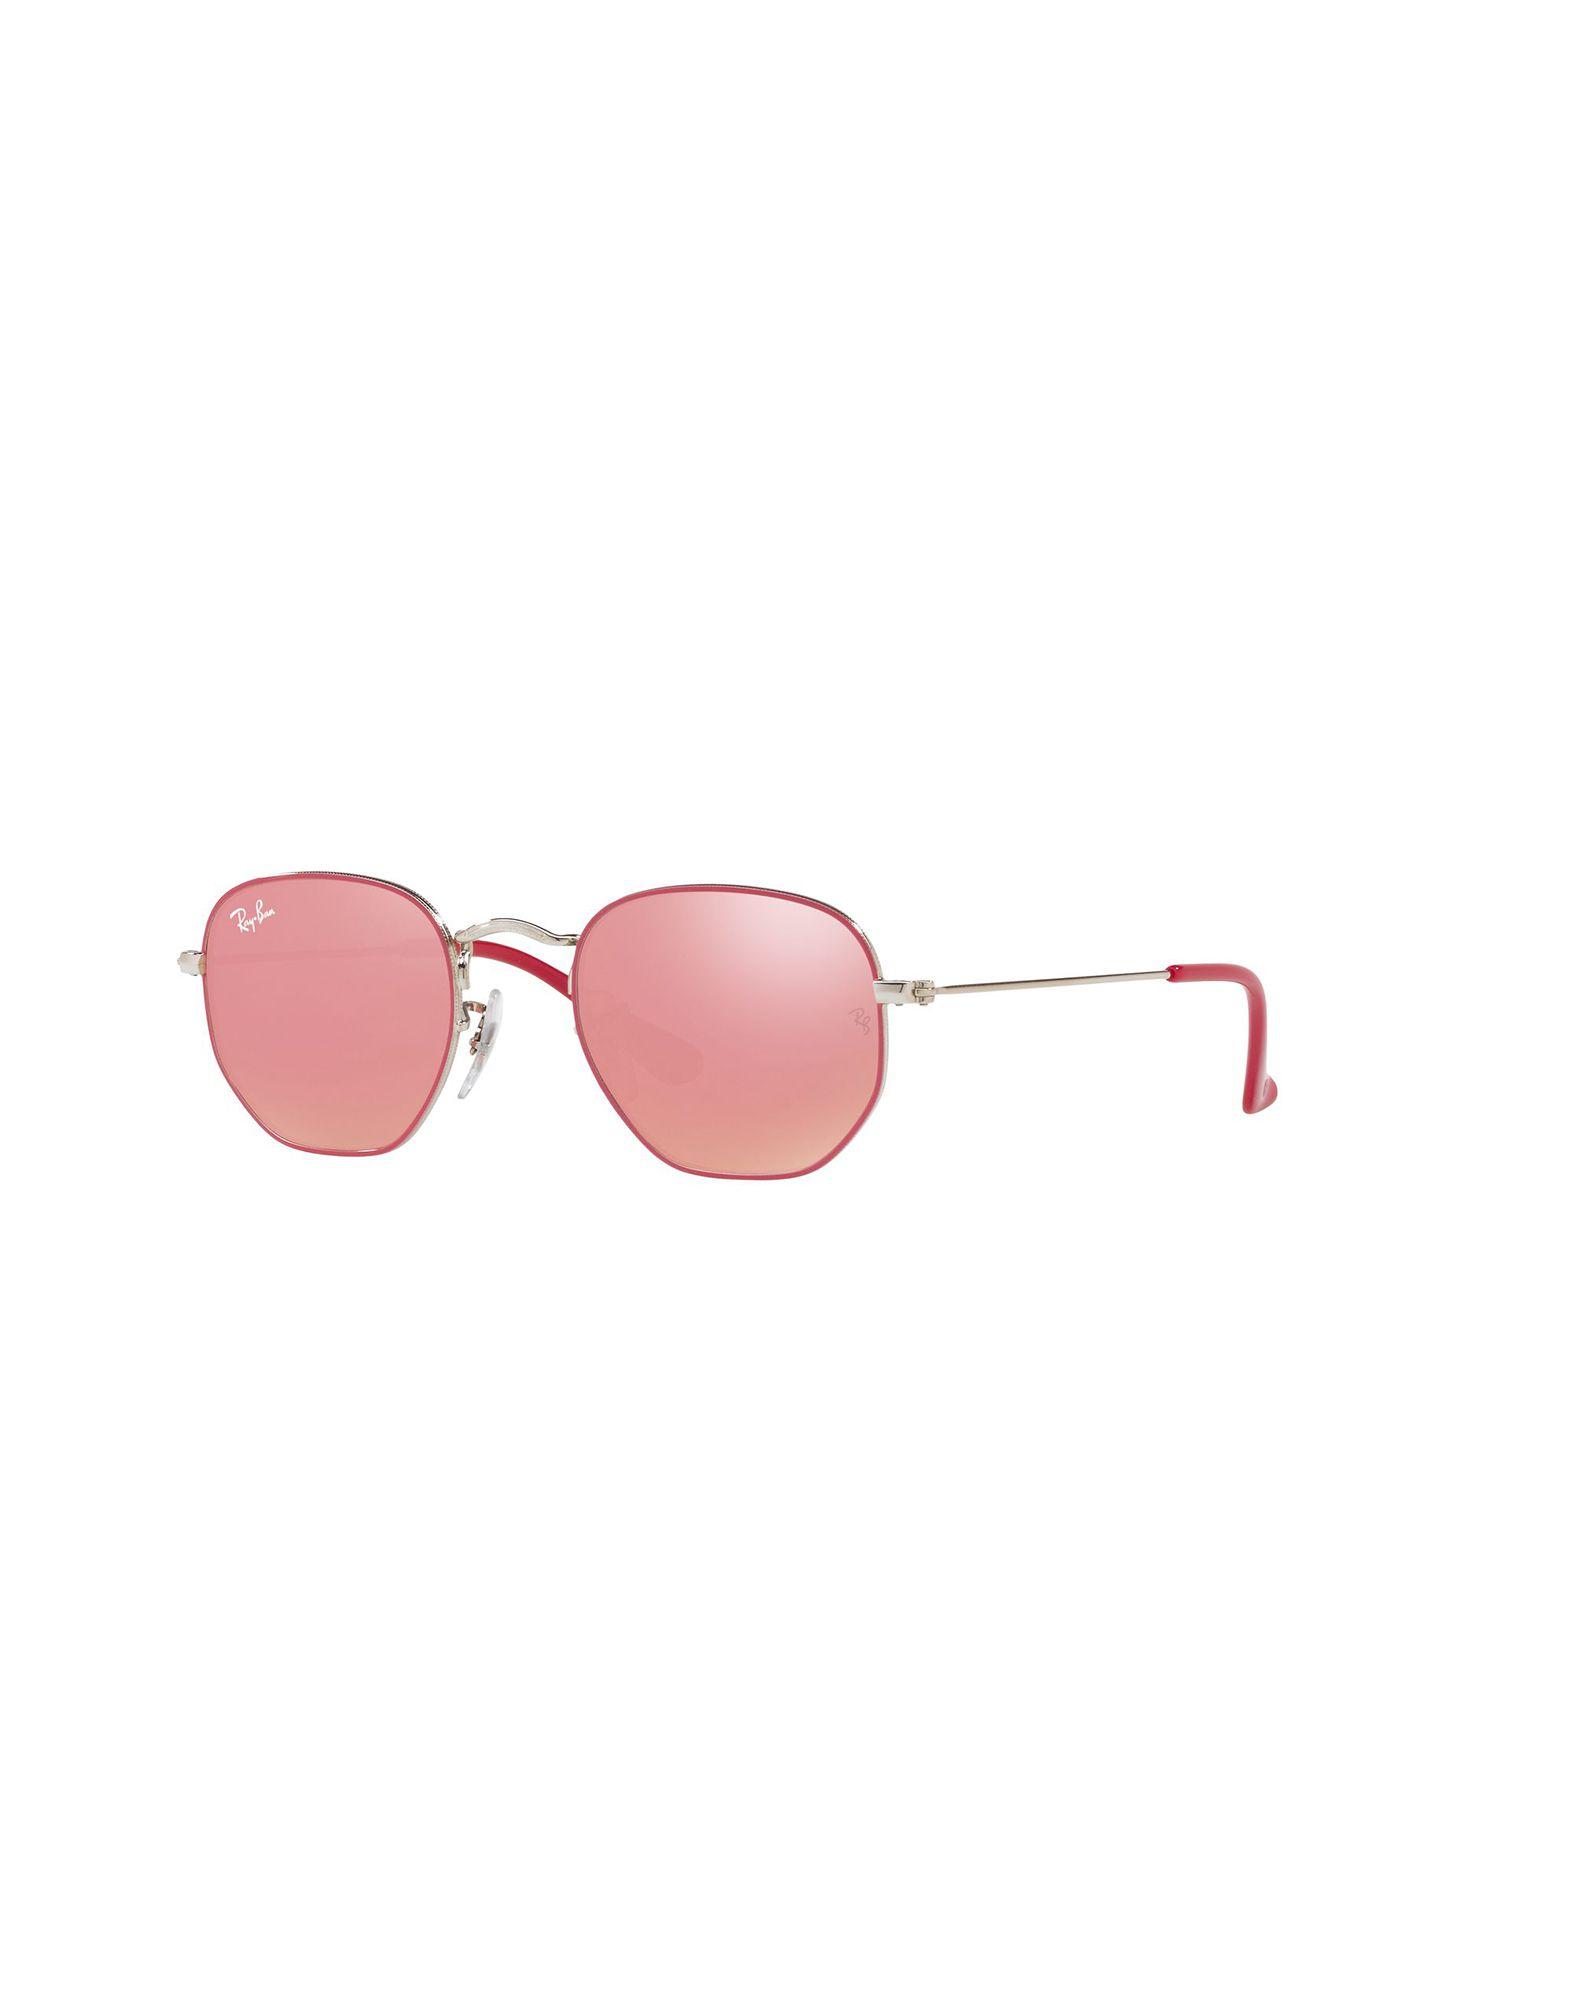 Фото - RAY-BAN JUNIOR Солнечные очки dvd blu ray